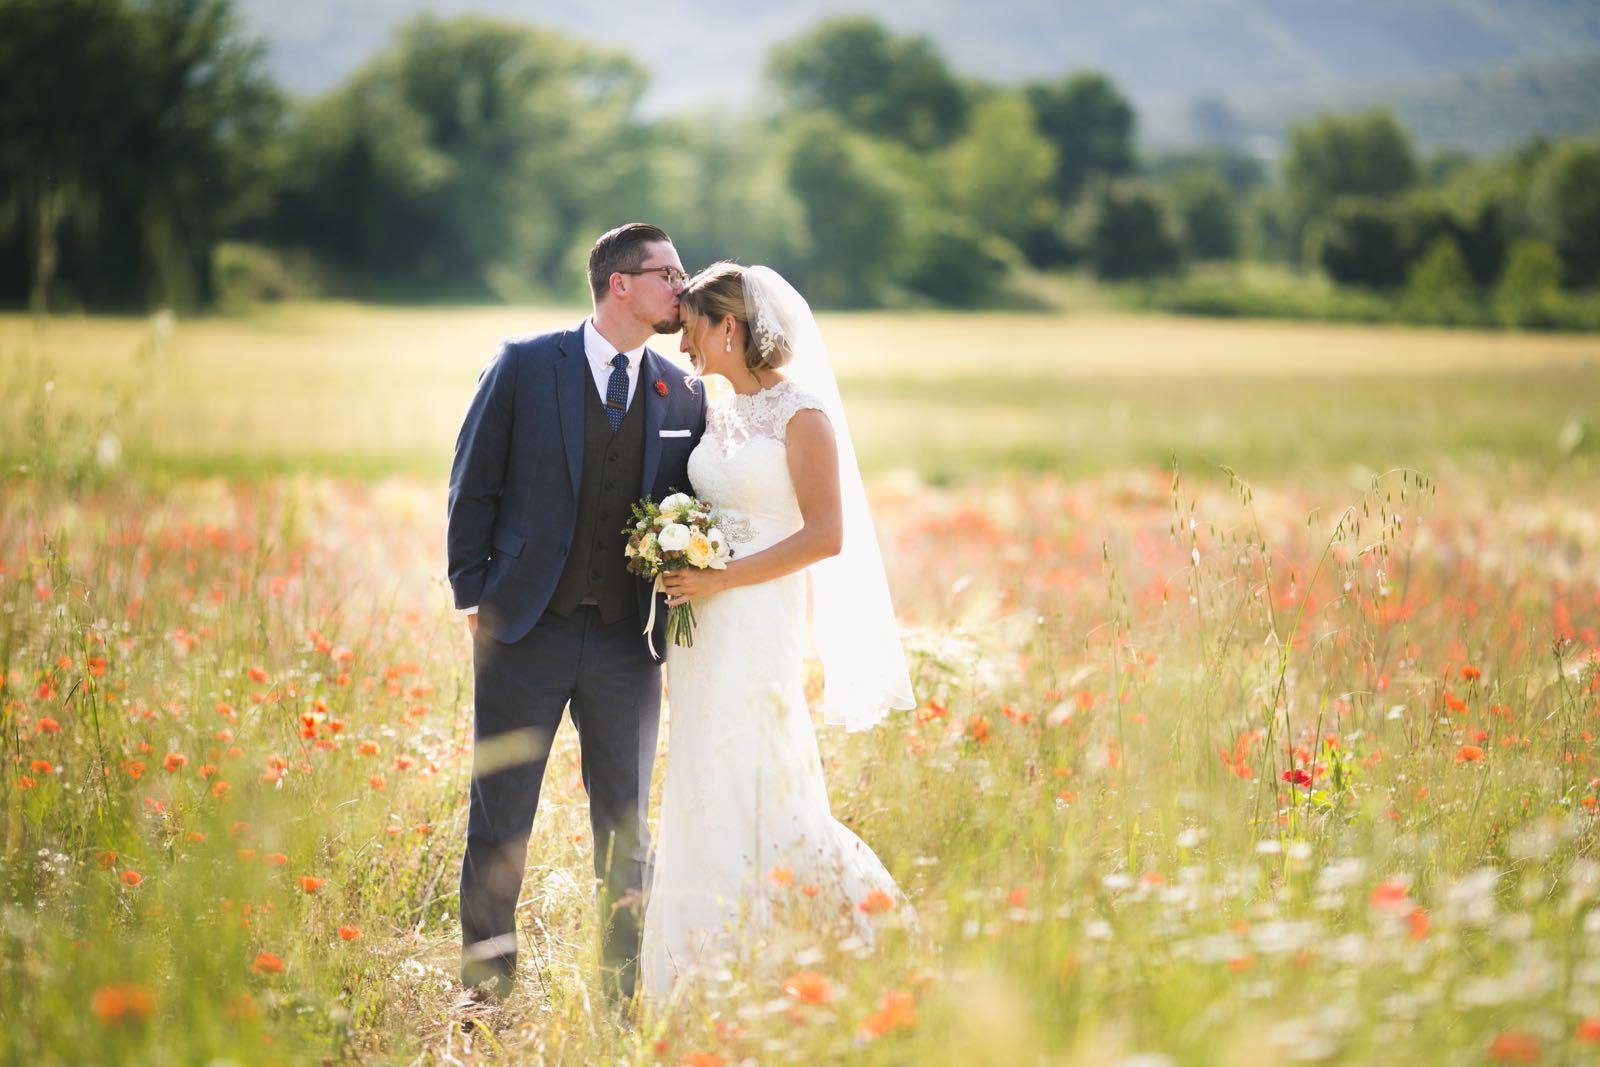 Wedding photo, wildflowers in Tuscany